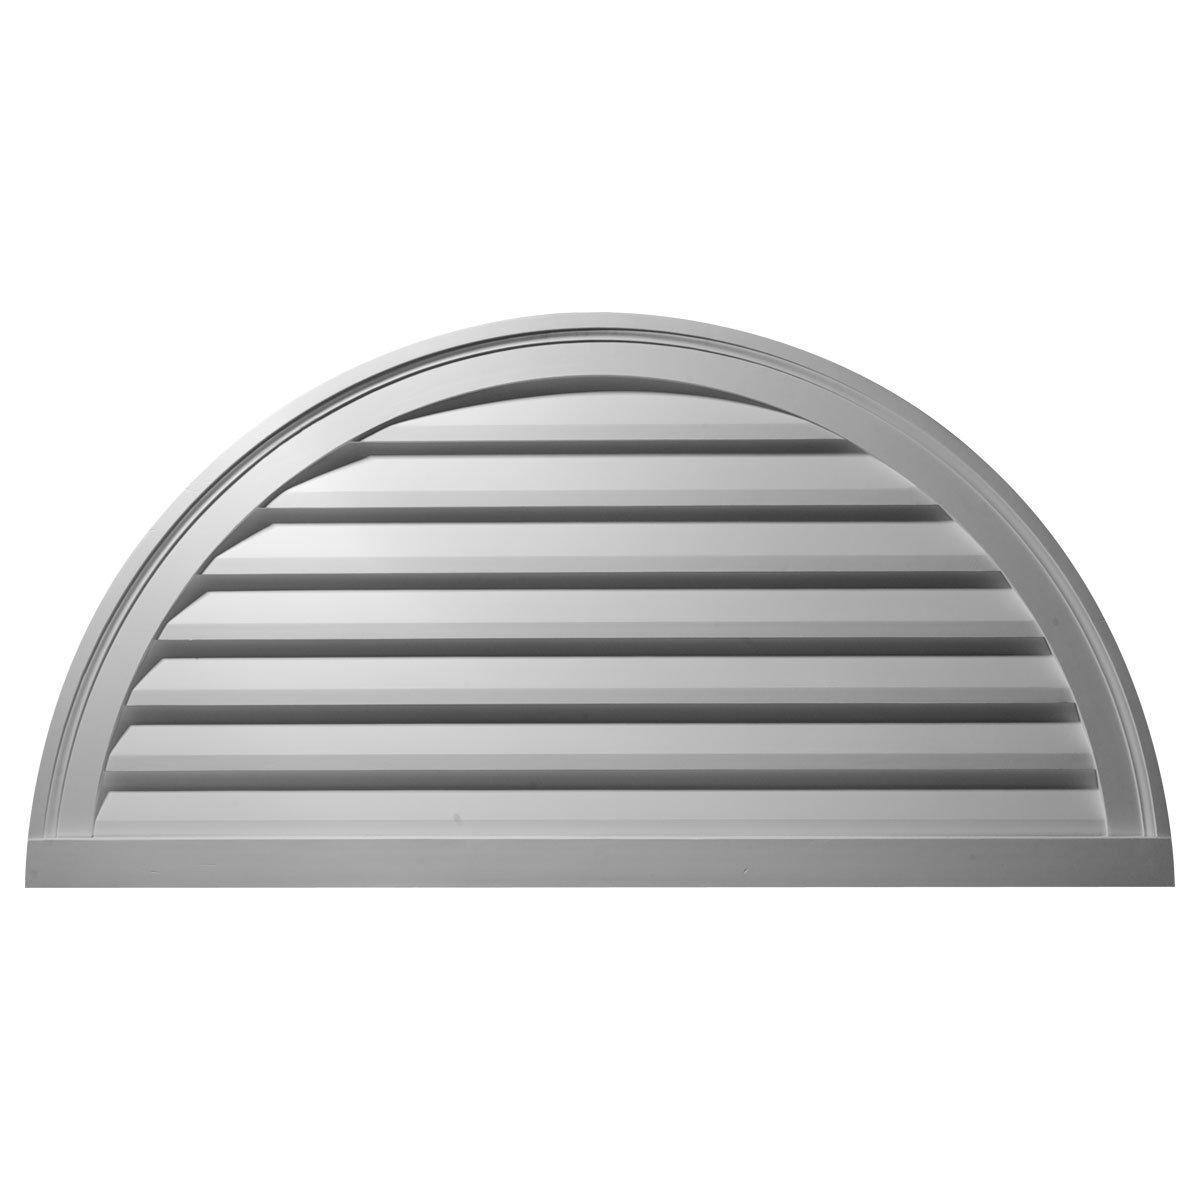 Ekena Millwork GVHR60D 60-Inch W x 30-Inch H x 2 1/2-Inch P Half Round Gable Vent Louver, Decorative